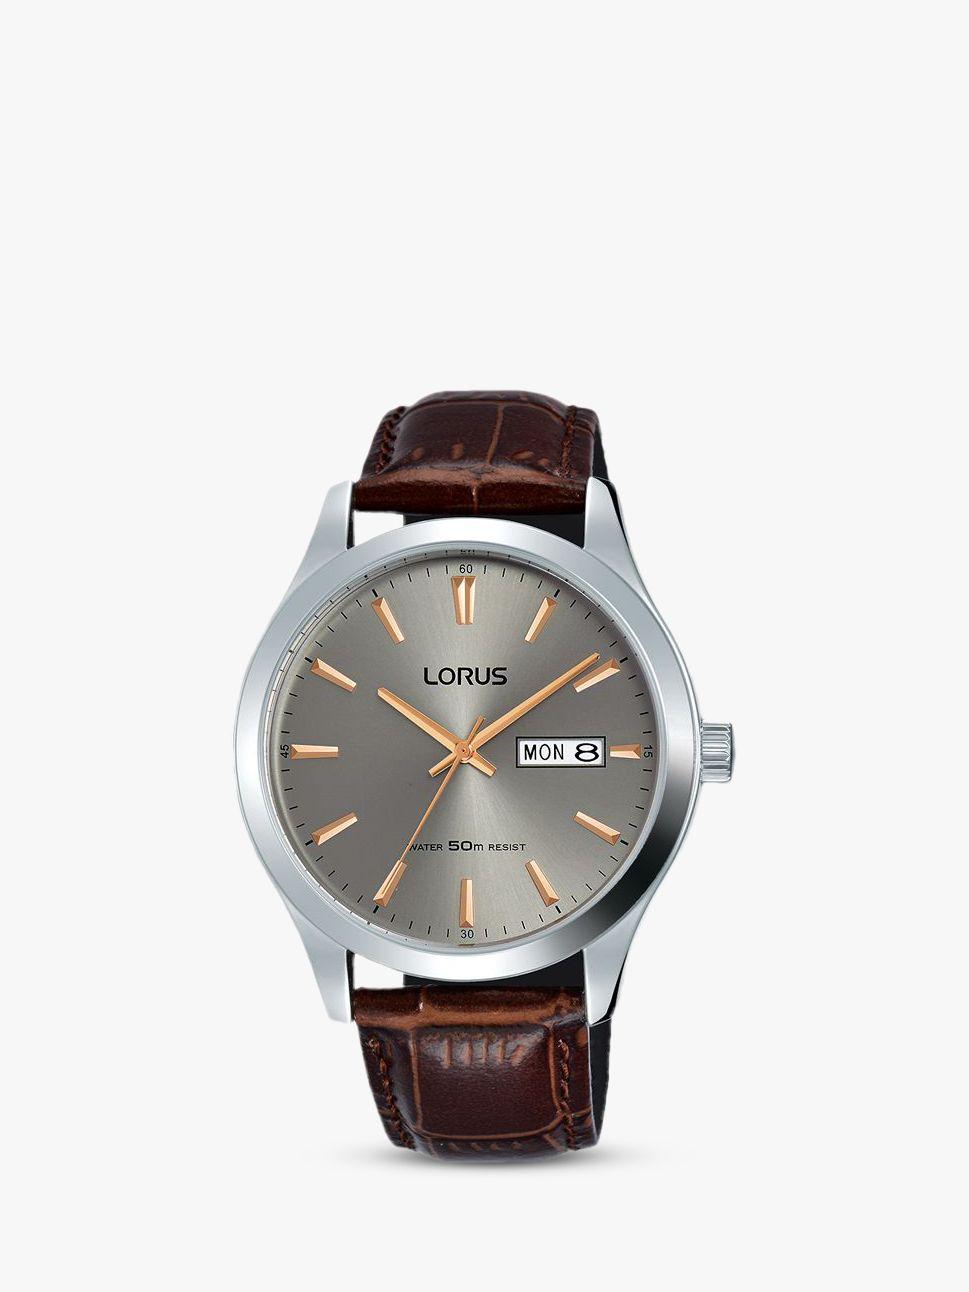 Lorus Lorus Men's Day Date Leather Strap Watch, Brown/Silver RXN61DX9